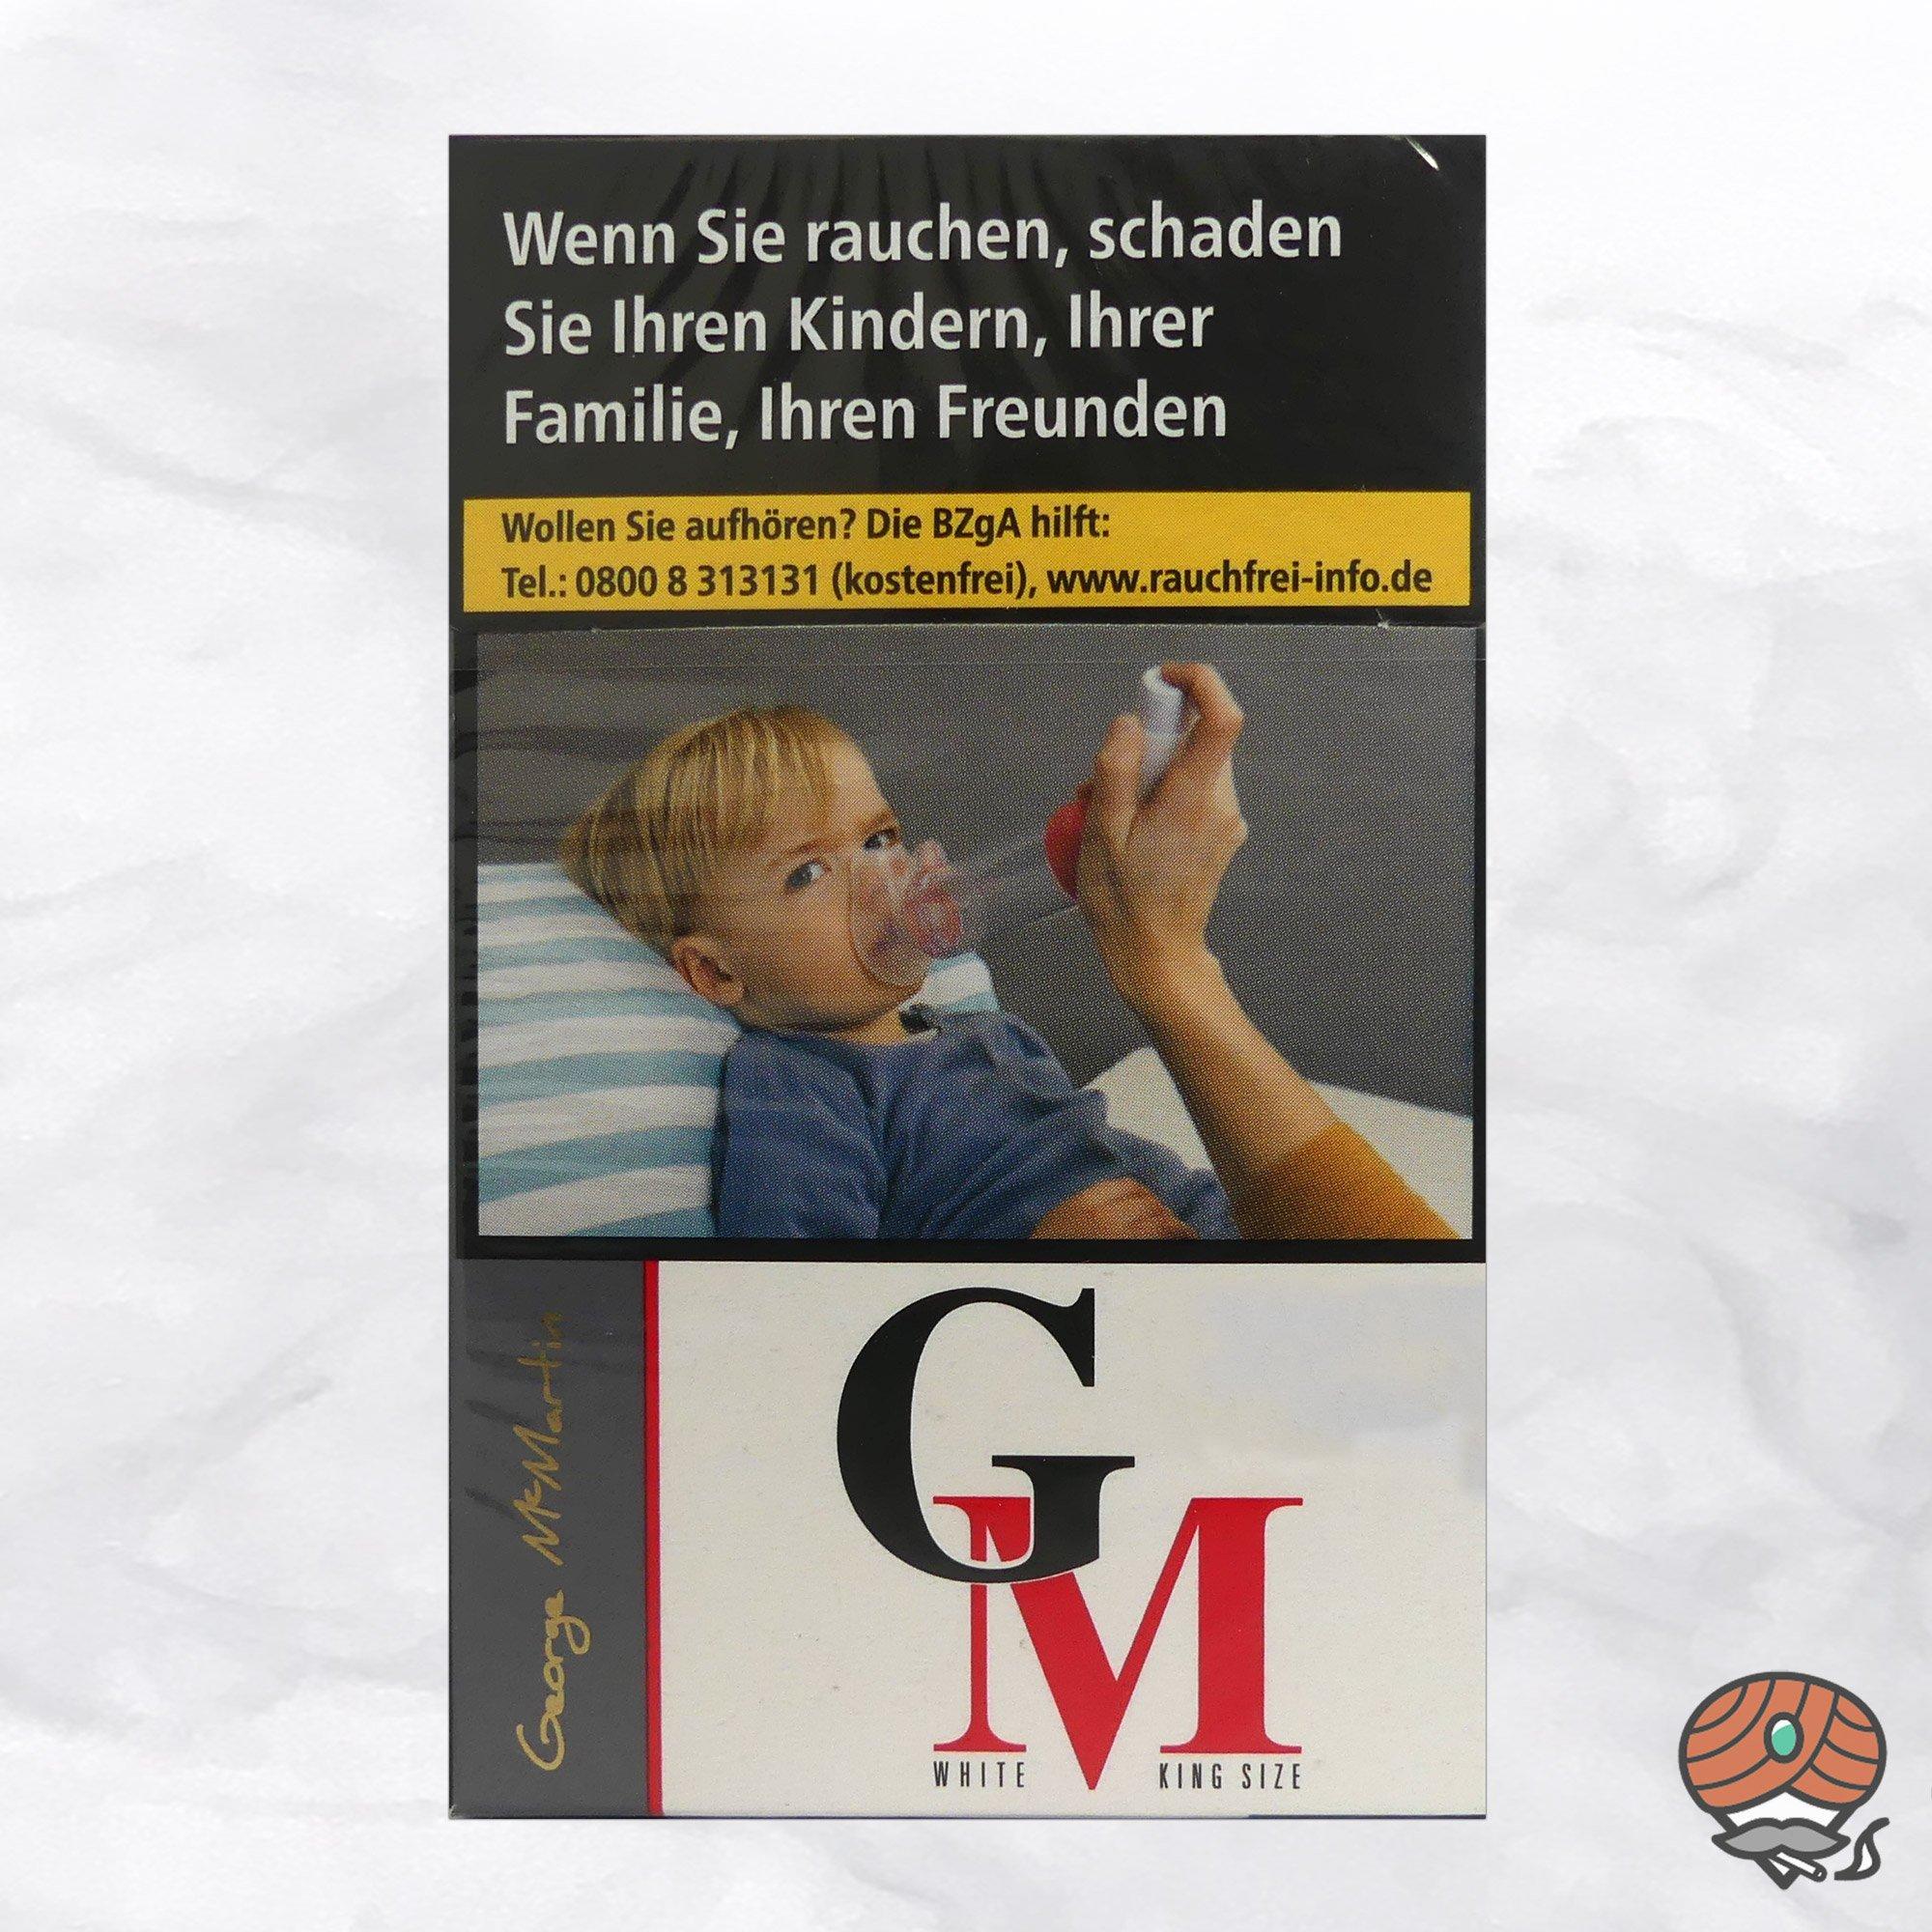 George Mc Martin (GM) White Filterzigaretten - 20 Zigaretten